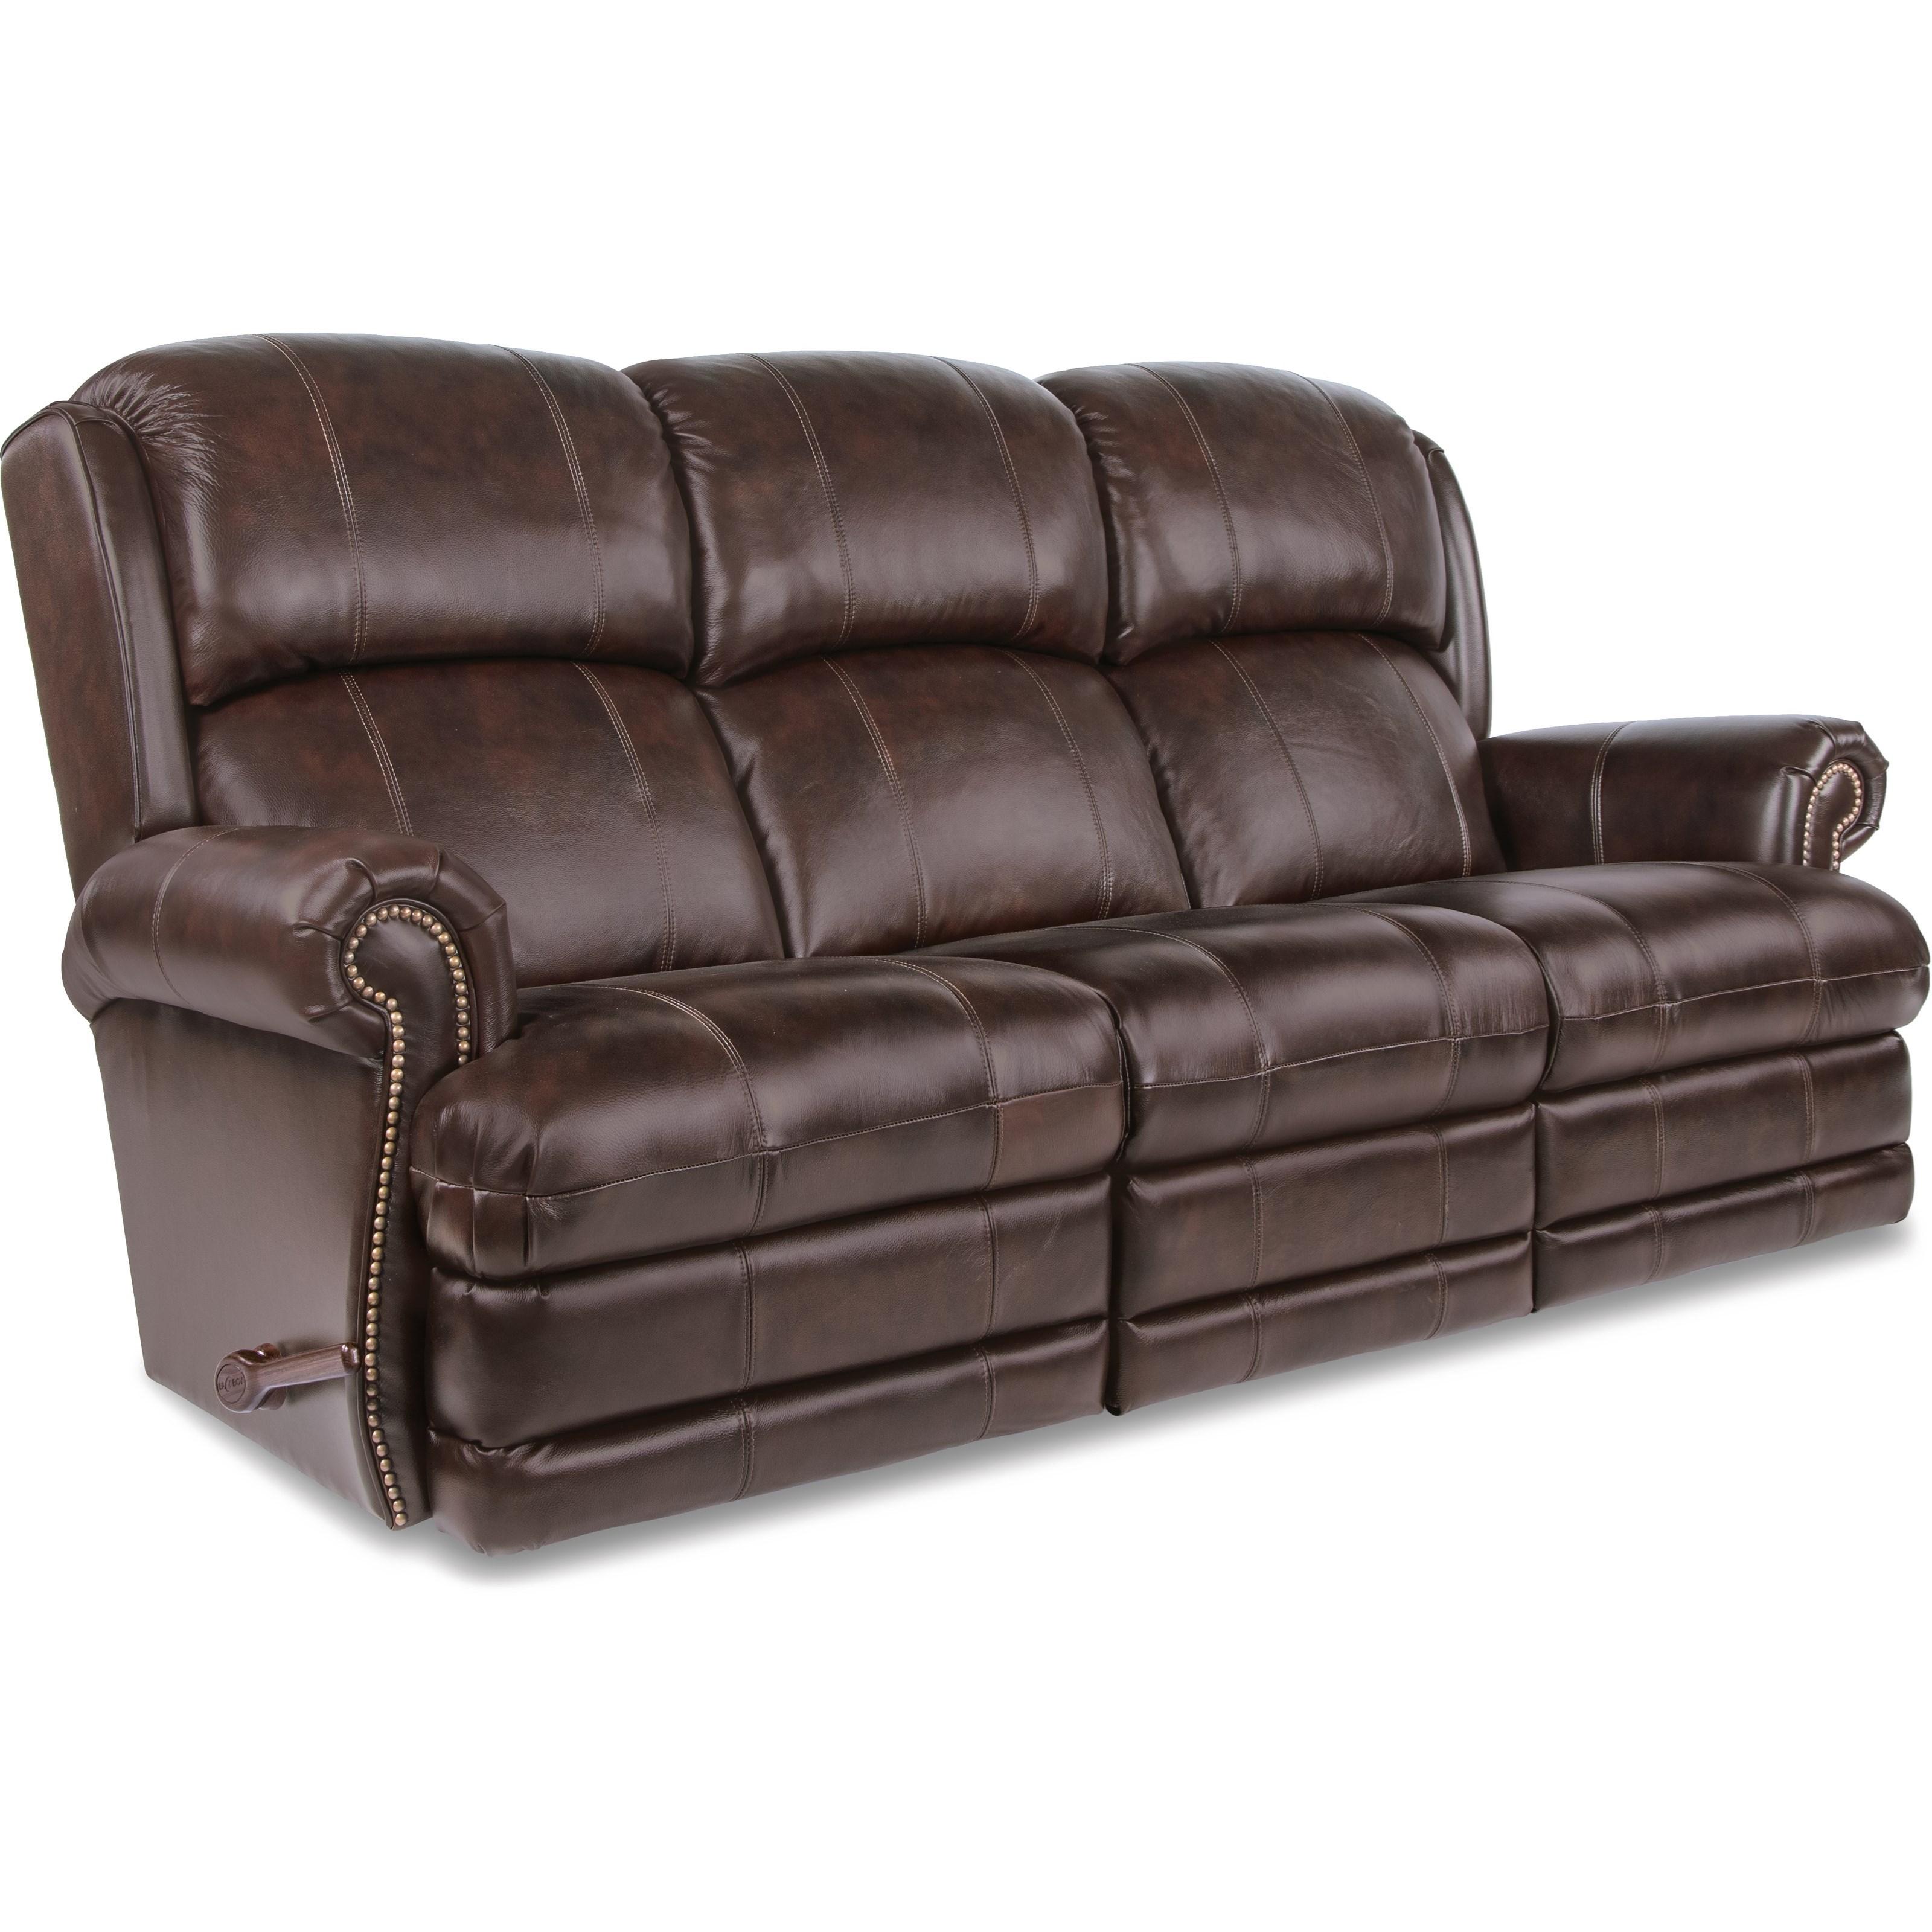 La z boy kirkwood traditional space saver reclining sofa for Traditional style reclining sofa